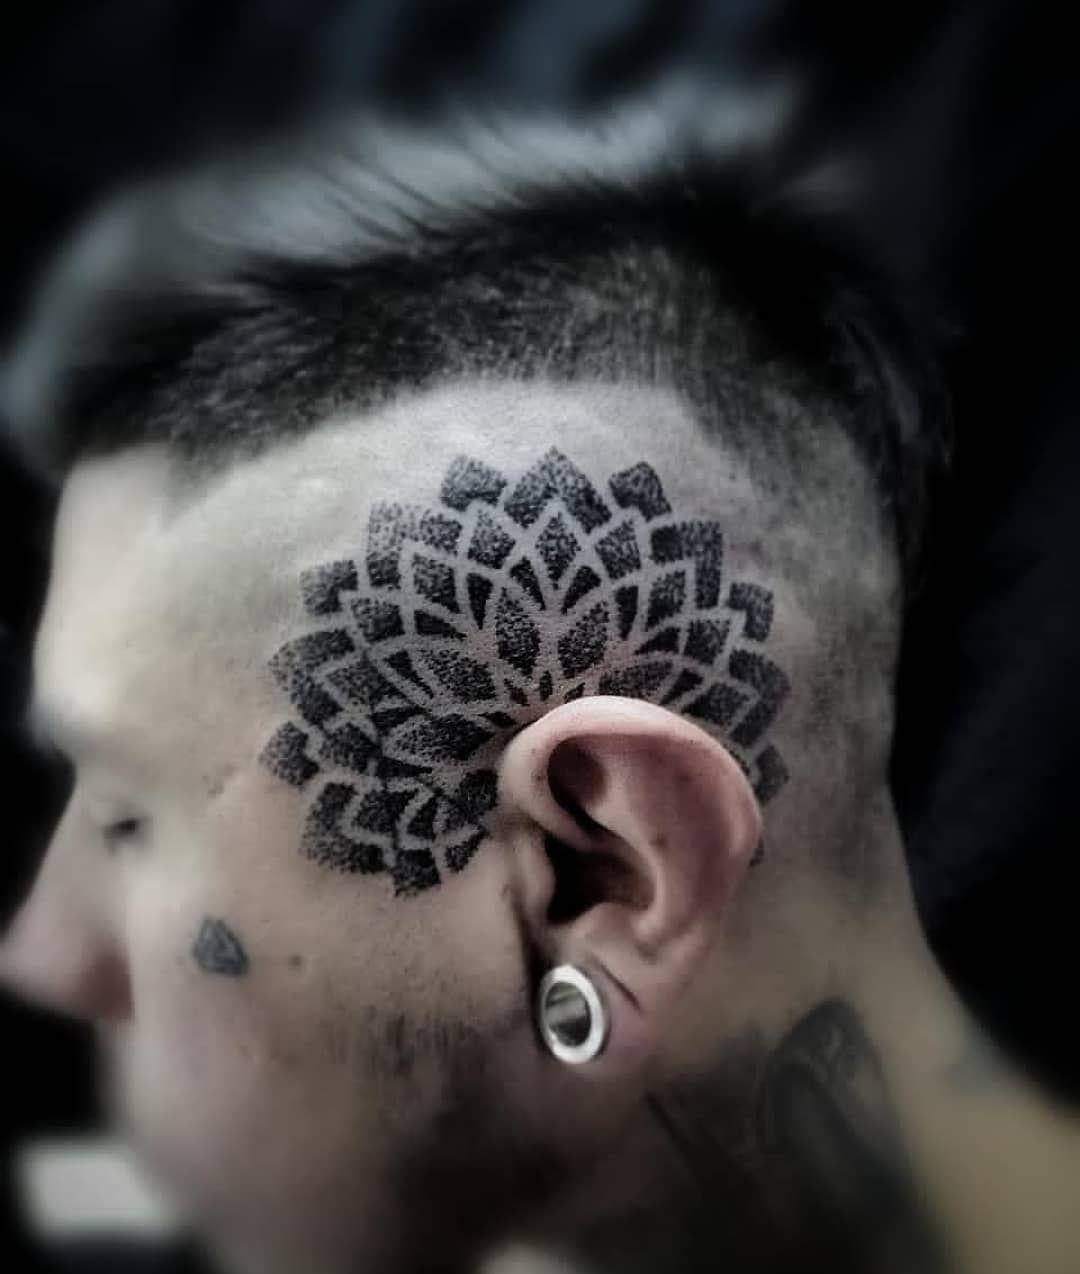 Sigan a @josephmontesr para más trabajos asombrosos. Artista #pommenoireart - - #tattooed #tattoodesign #tattoolife #tattoolover #art #abstractart #sketch #realismotattoo #draw #arttattoo #instagood #instapic #artist #tattooist #geometrictattoo #blackwork #tattooideas #Tattoo #perutattoo #tattoostyle #peru #tattooofday #blackwork #tatuajes